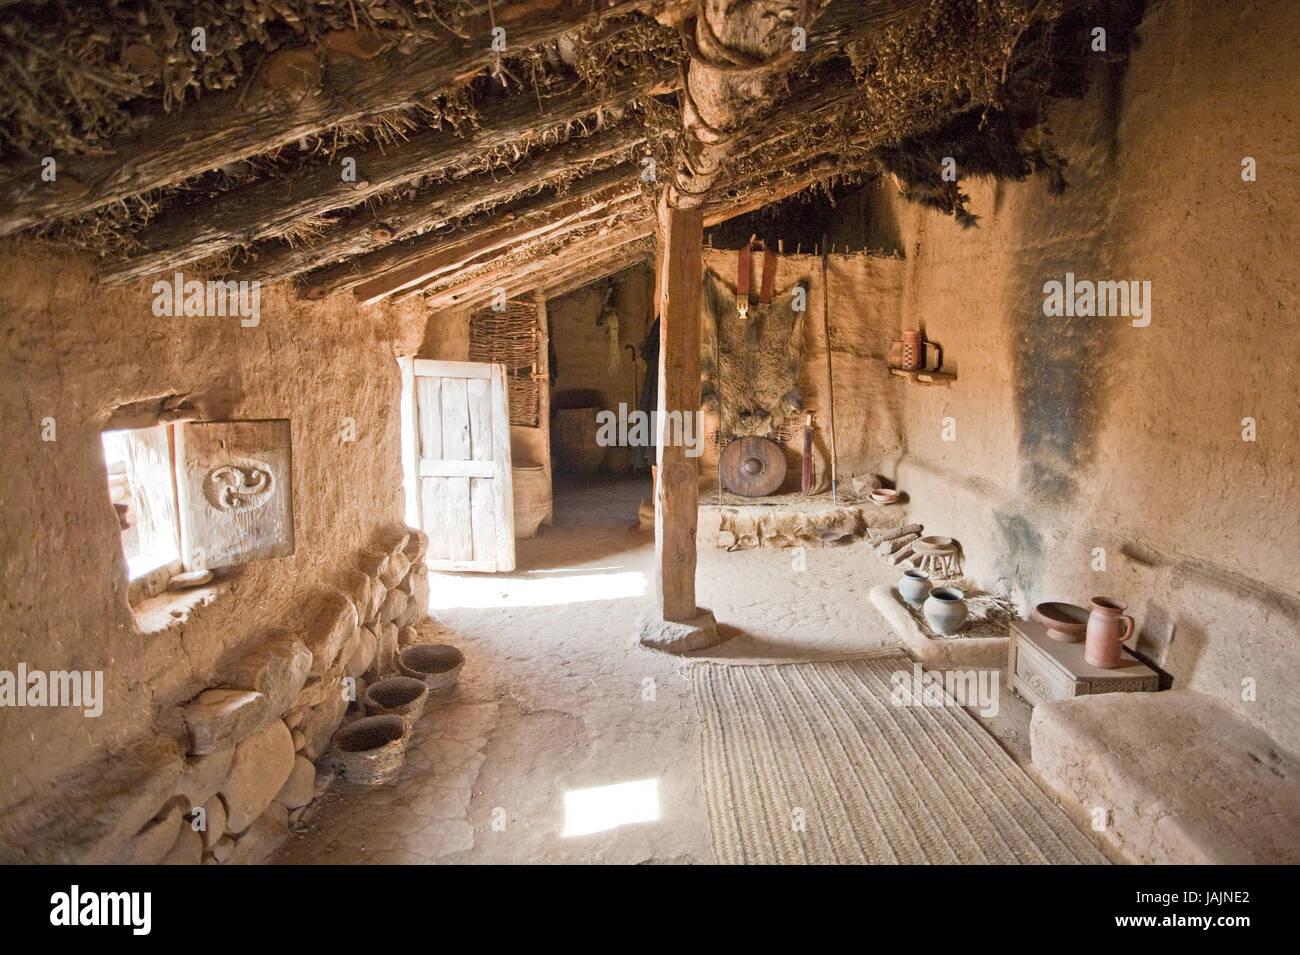 Spain,province of Soria,ruins of Numancia,house,inside, - Stock Image